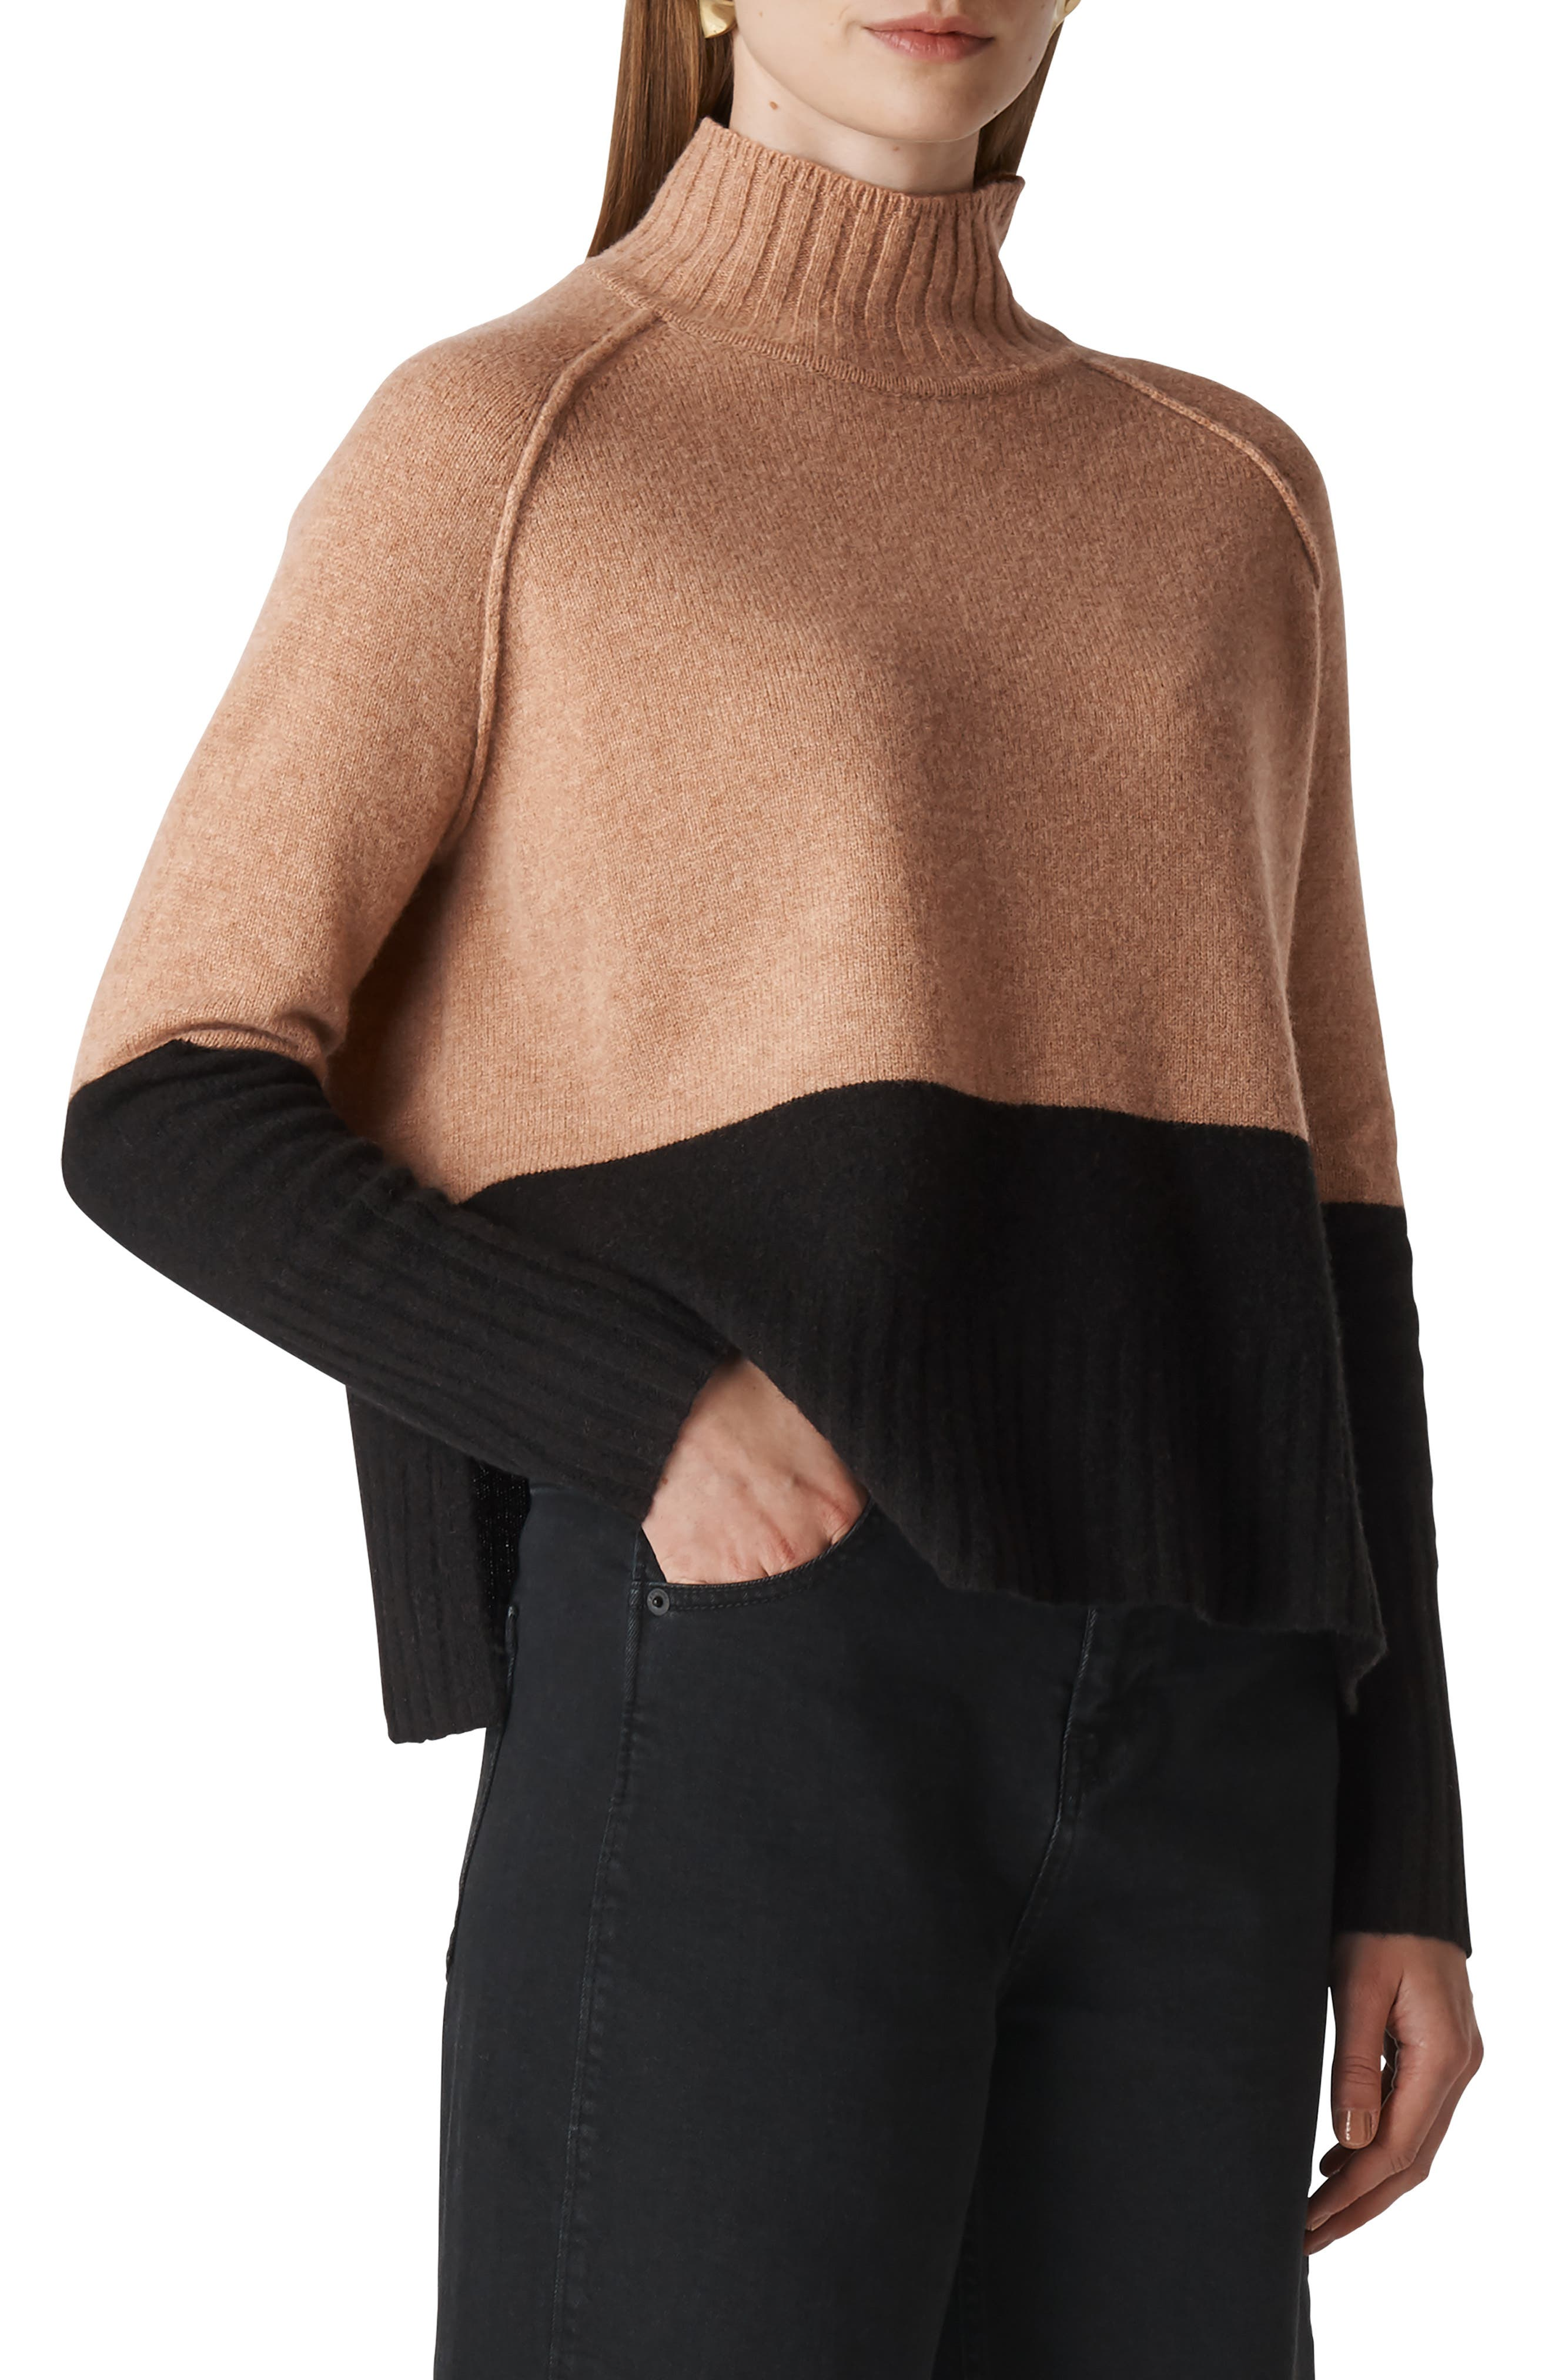 WHISTLES Color-Blocked Merino Wool Sweater in Black